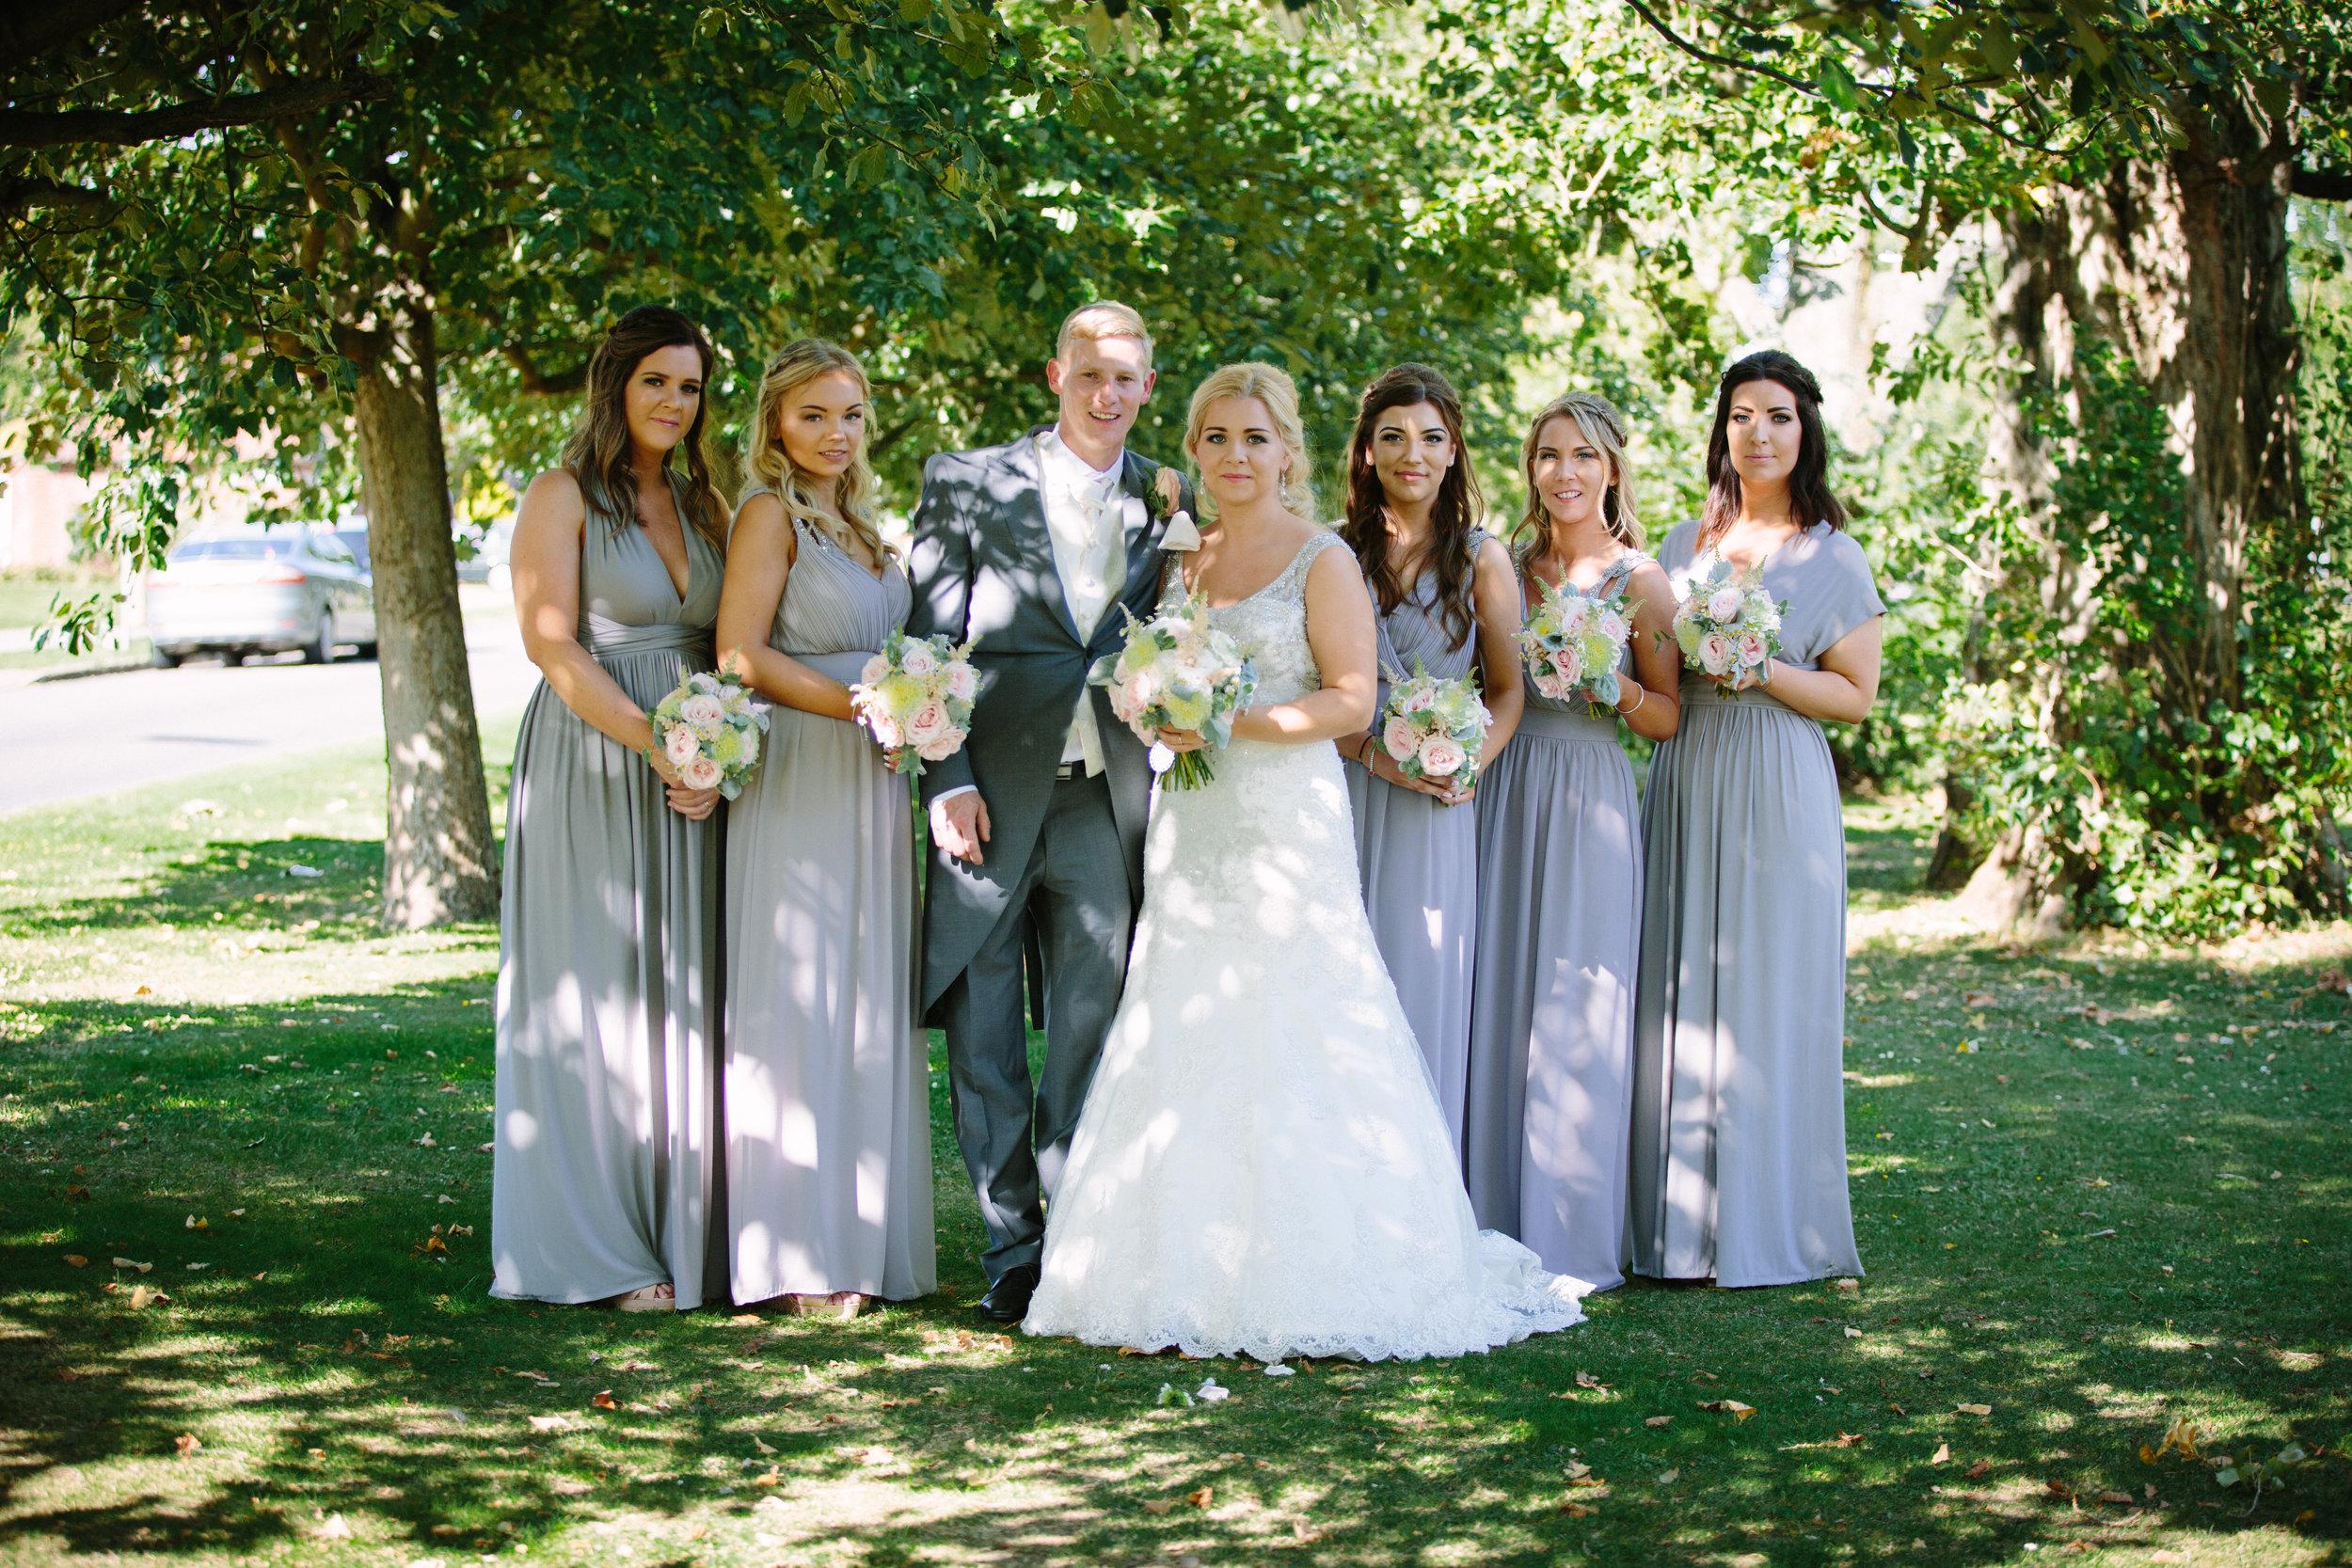 hitchin-hertfordshire-london-wedding-photography-catholic-church-group-formal-41